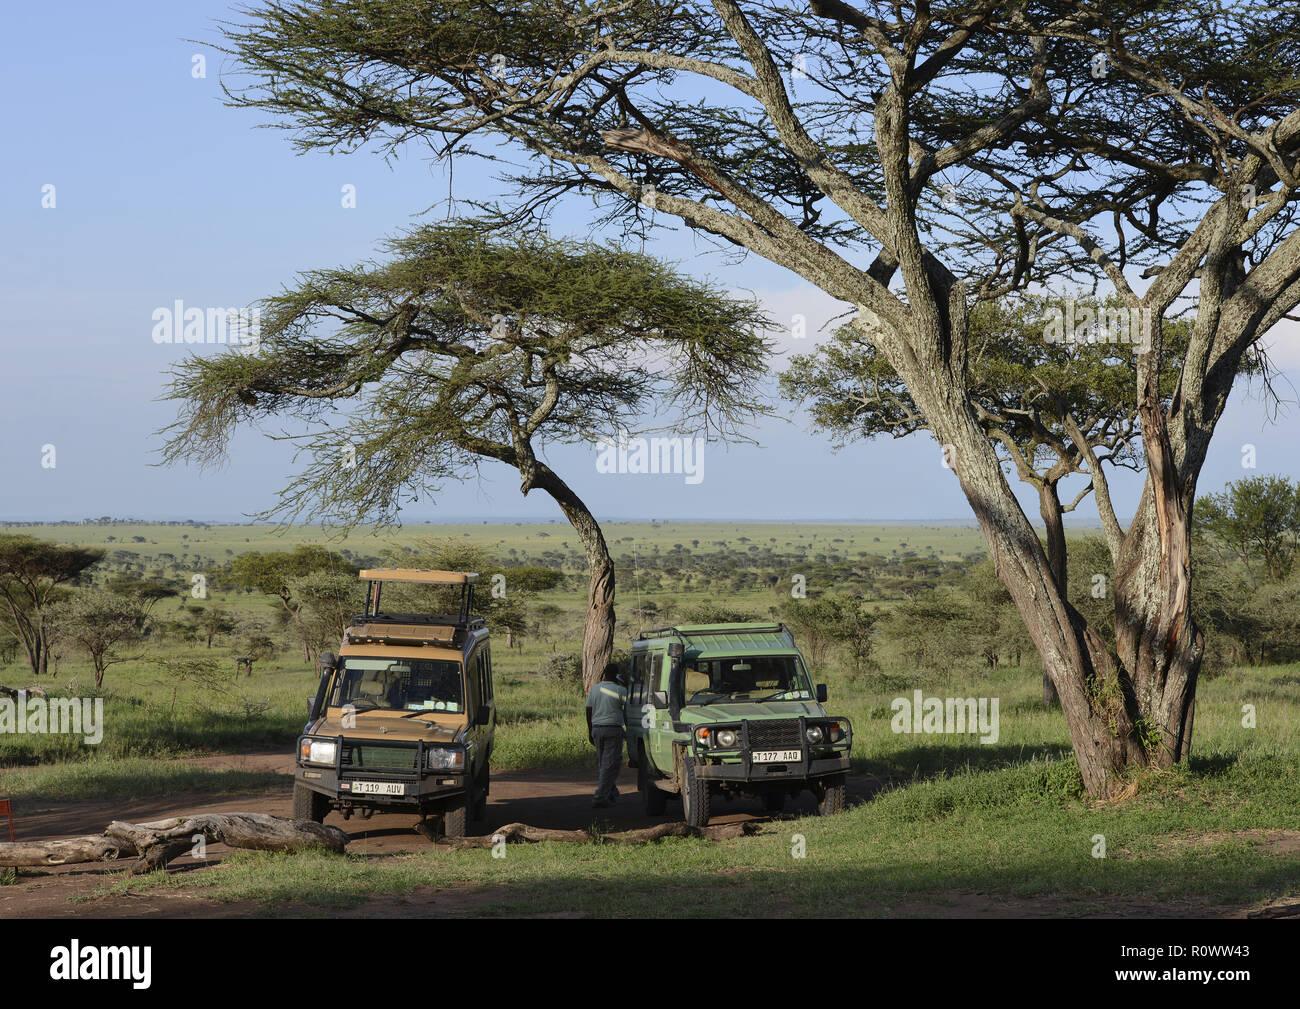 Safari-Fahrzeuge unter Akazien, Serengeti NP, Tansania - Stock Image